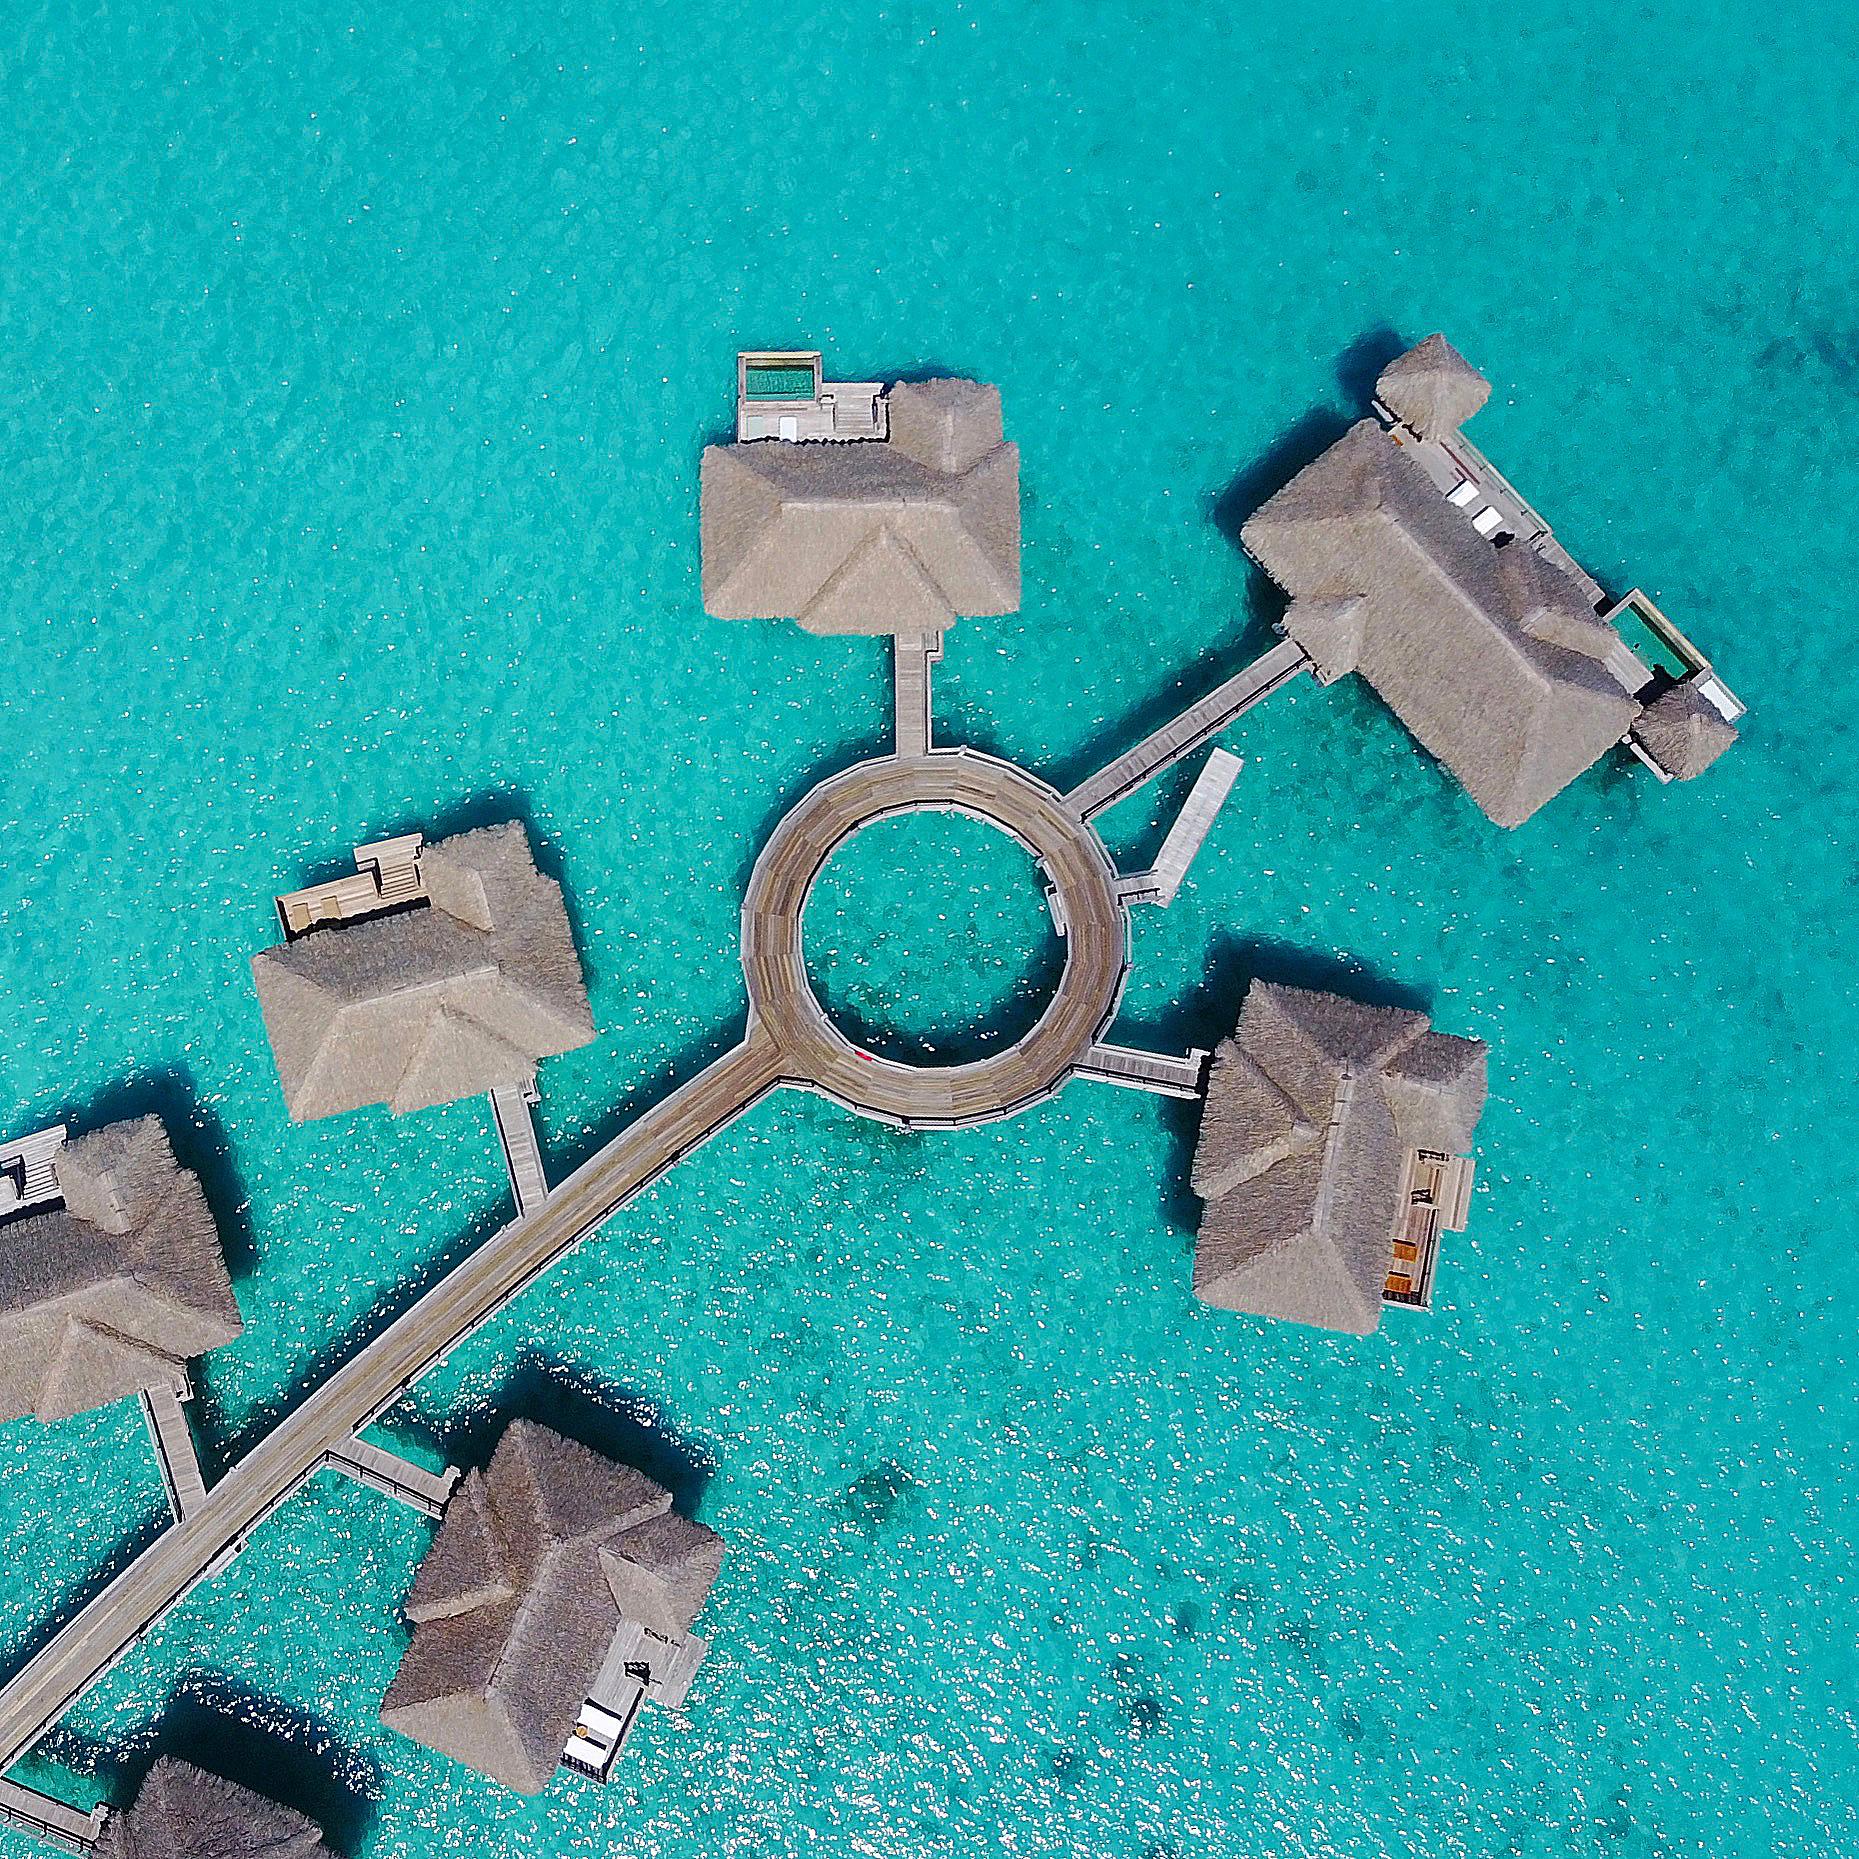 french-polynesia-IMG_4209.jpg